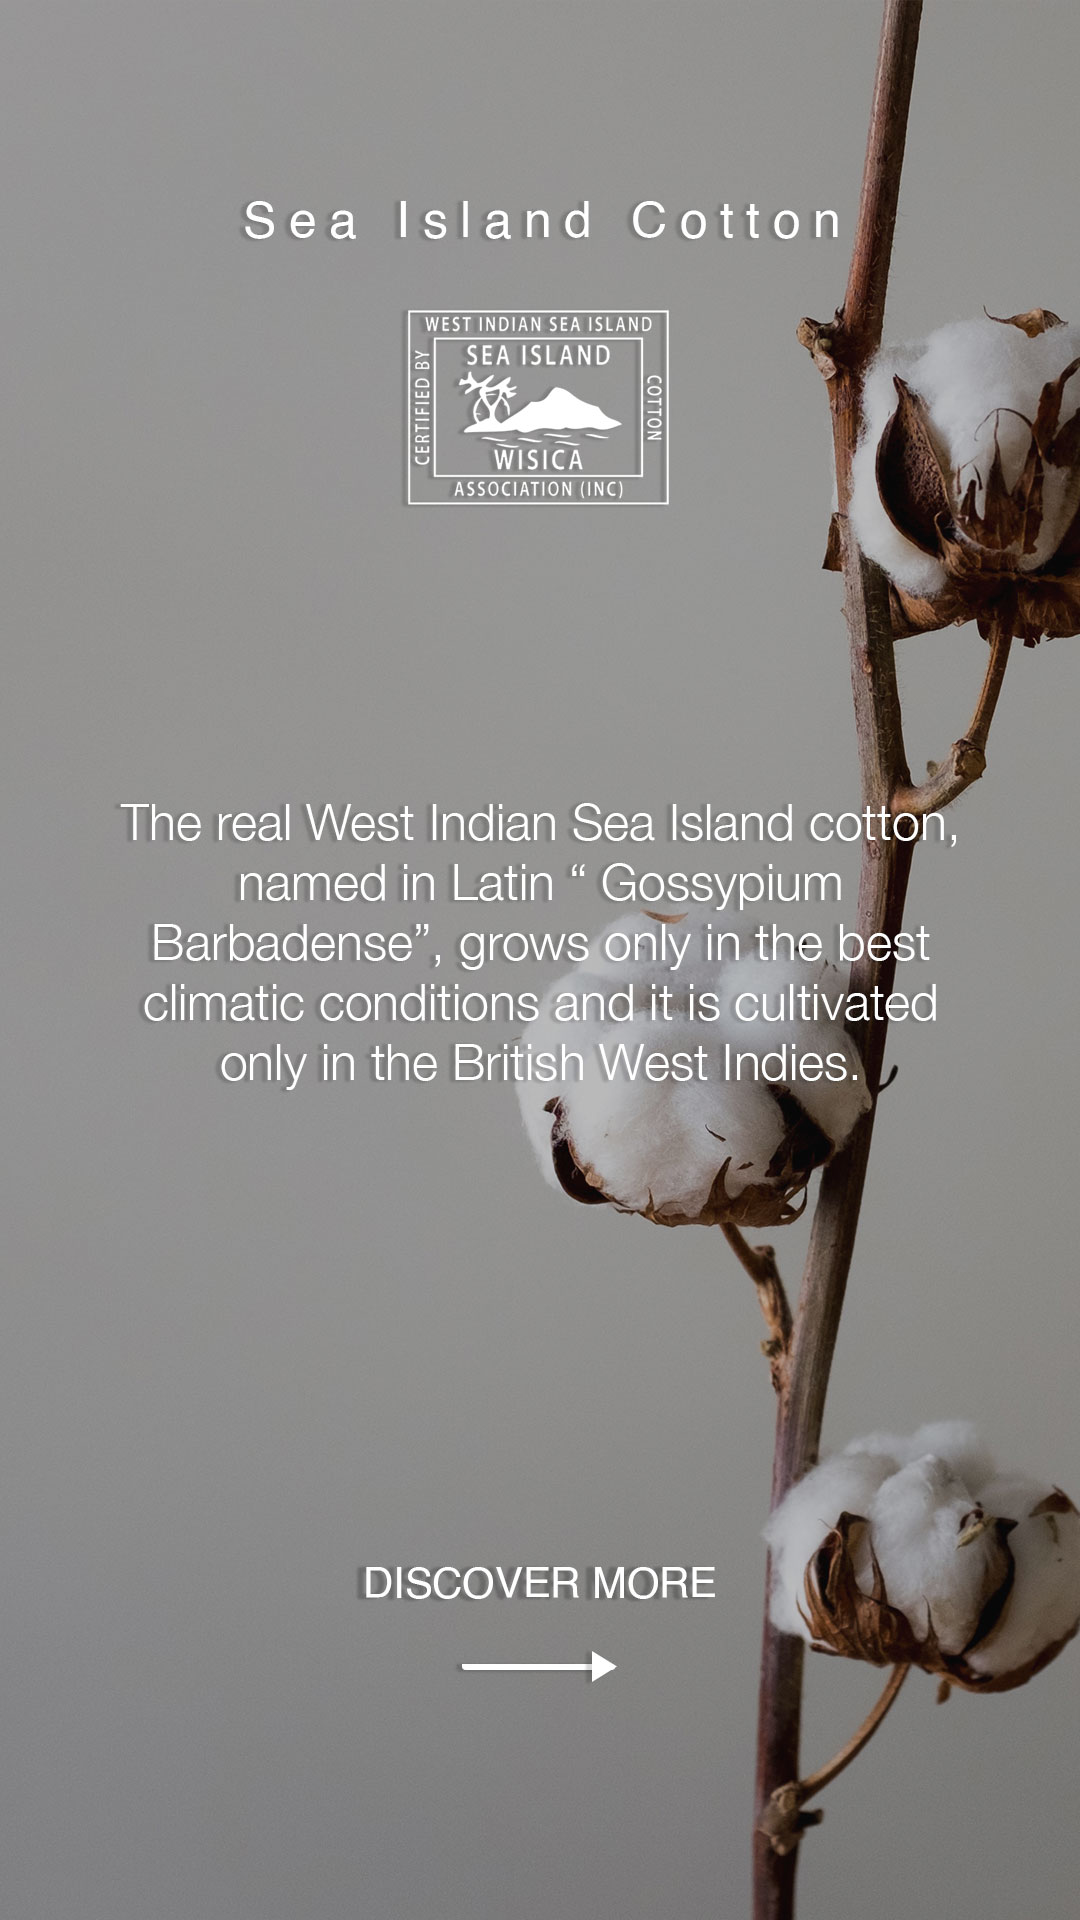 SEA ISLAND COTTON: A LOVE OF NATURE